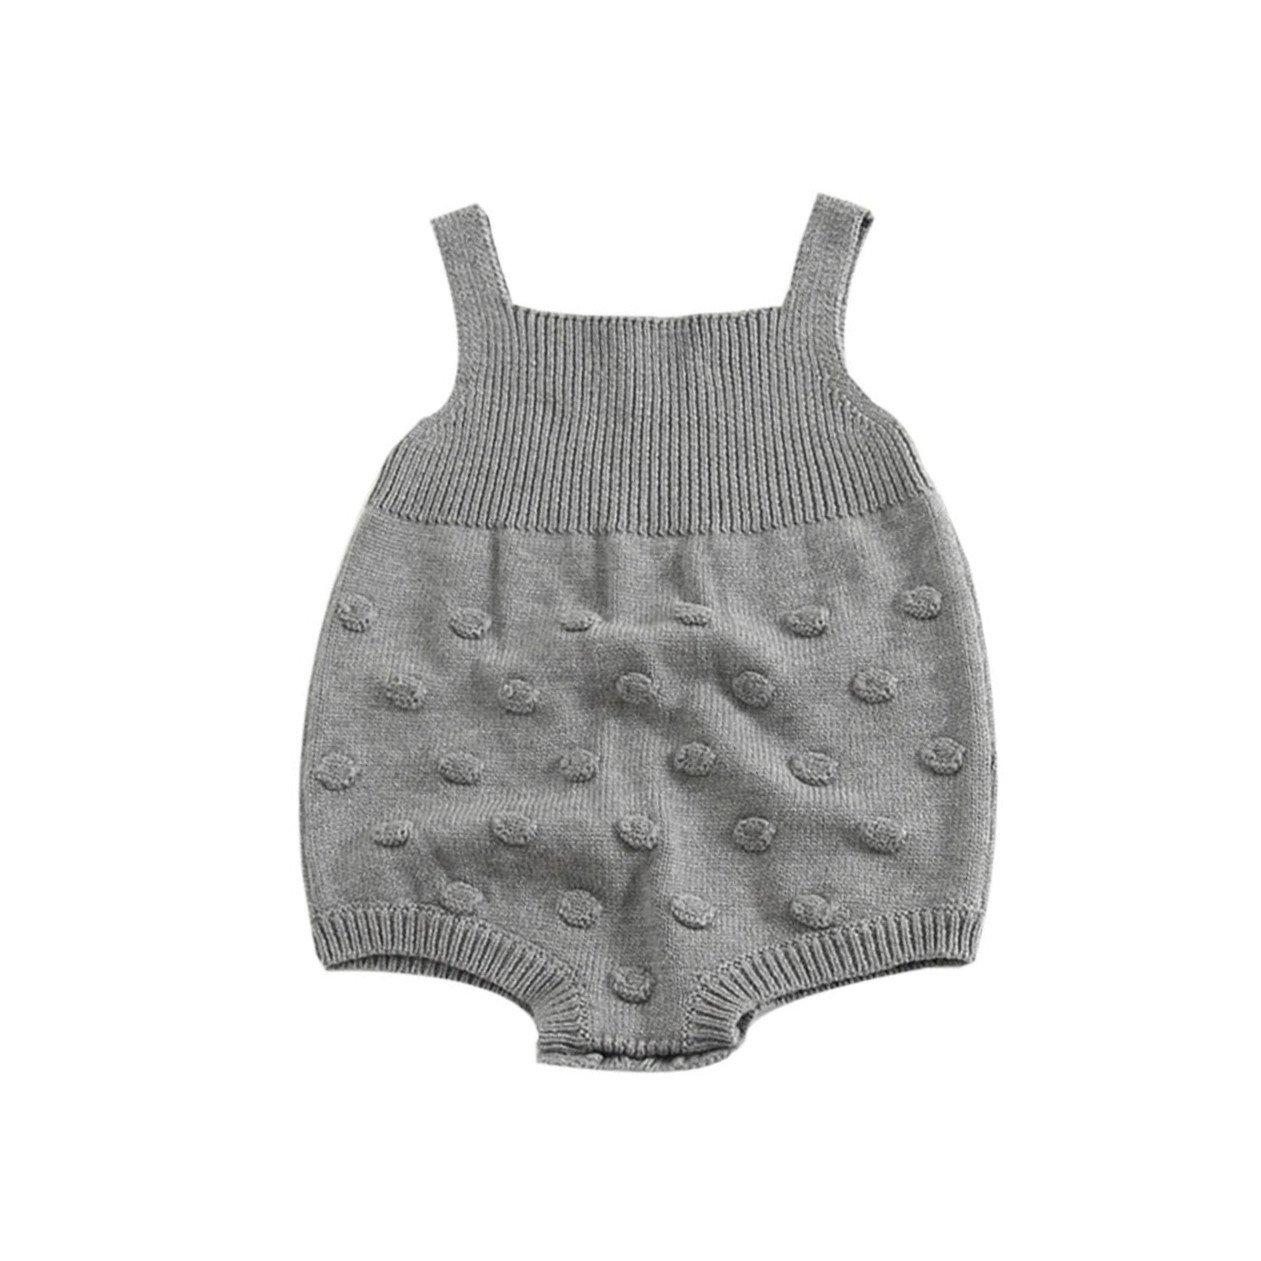 SHOBDW Girls Rompers, Baby Kids Girl Autumn Knitted Overalls Small Balls Infant Jumpsuit Romper SHOBDW-88